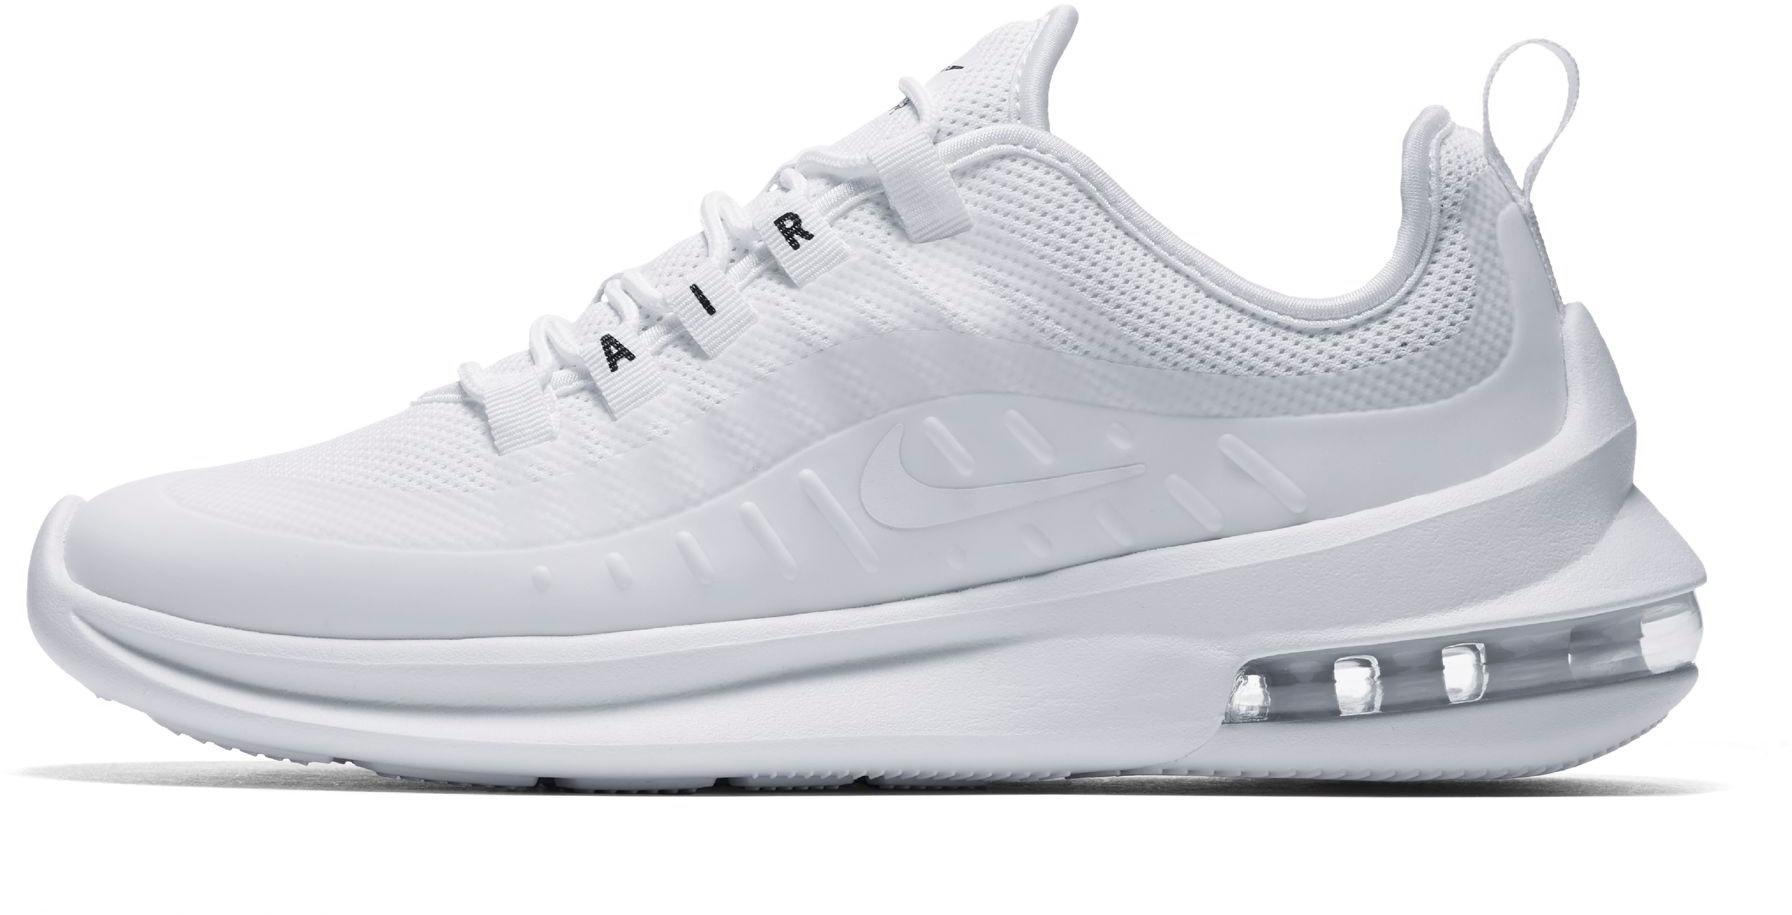 Nike Sportswear Air Max Axis Sneaker Damen weiß Damen Gr. 40